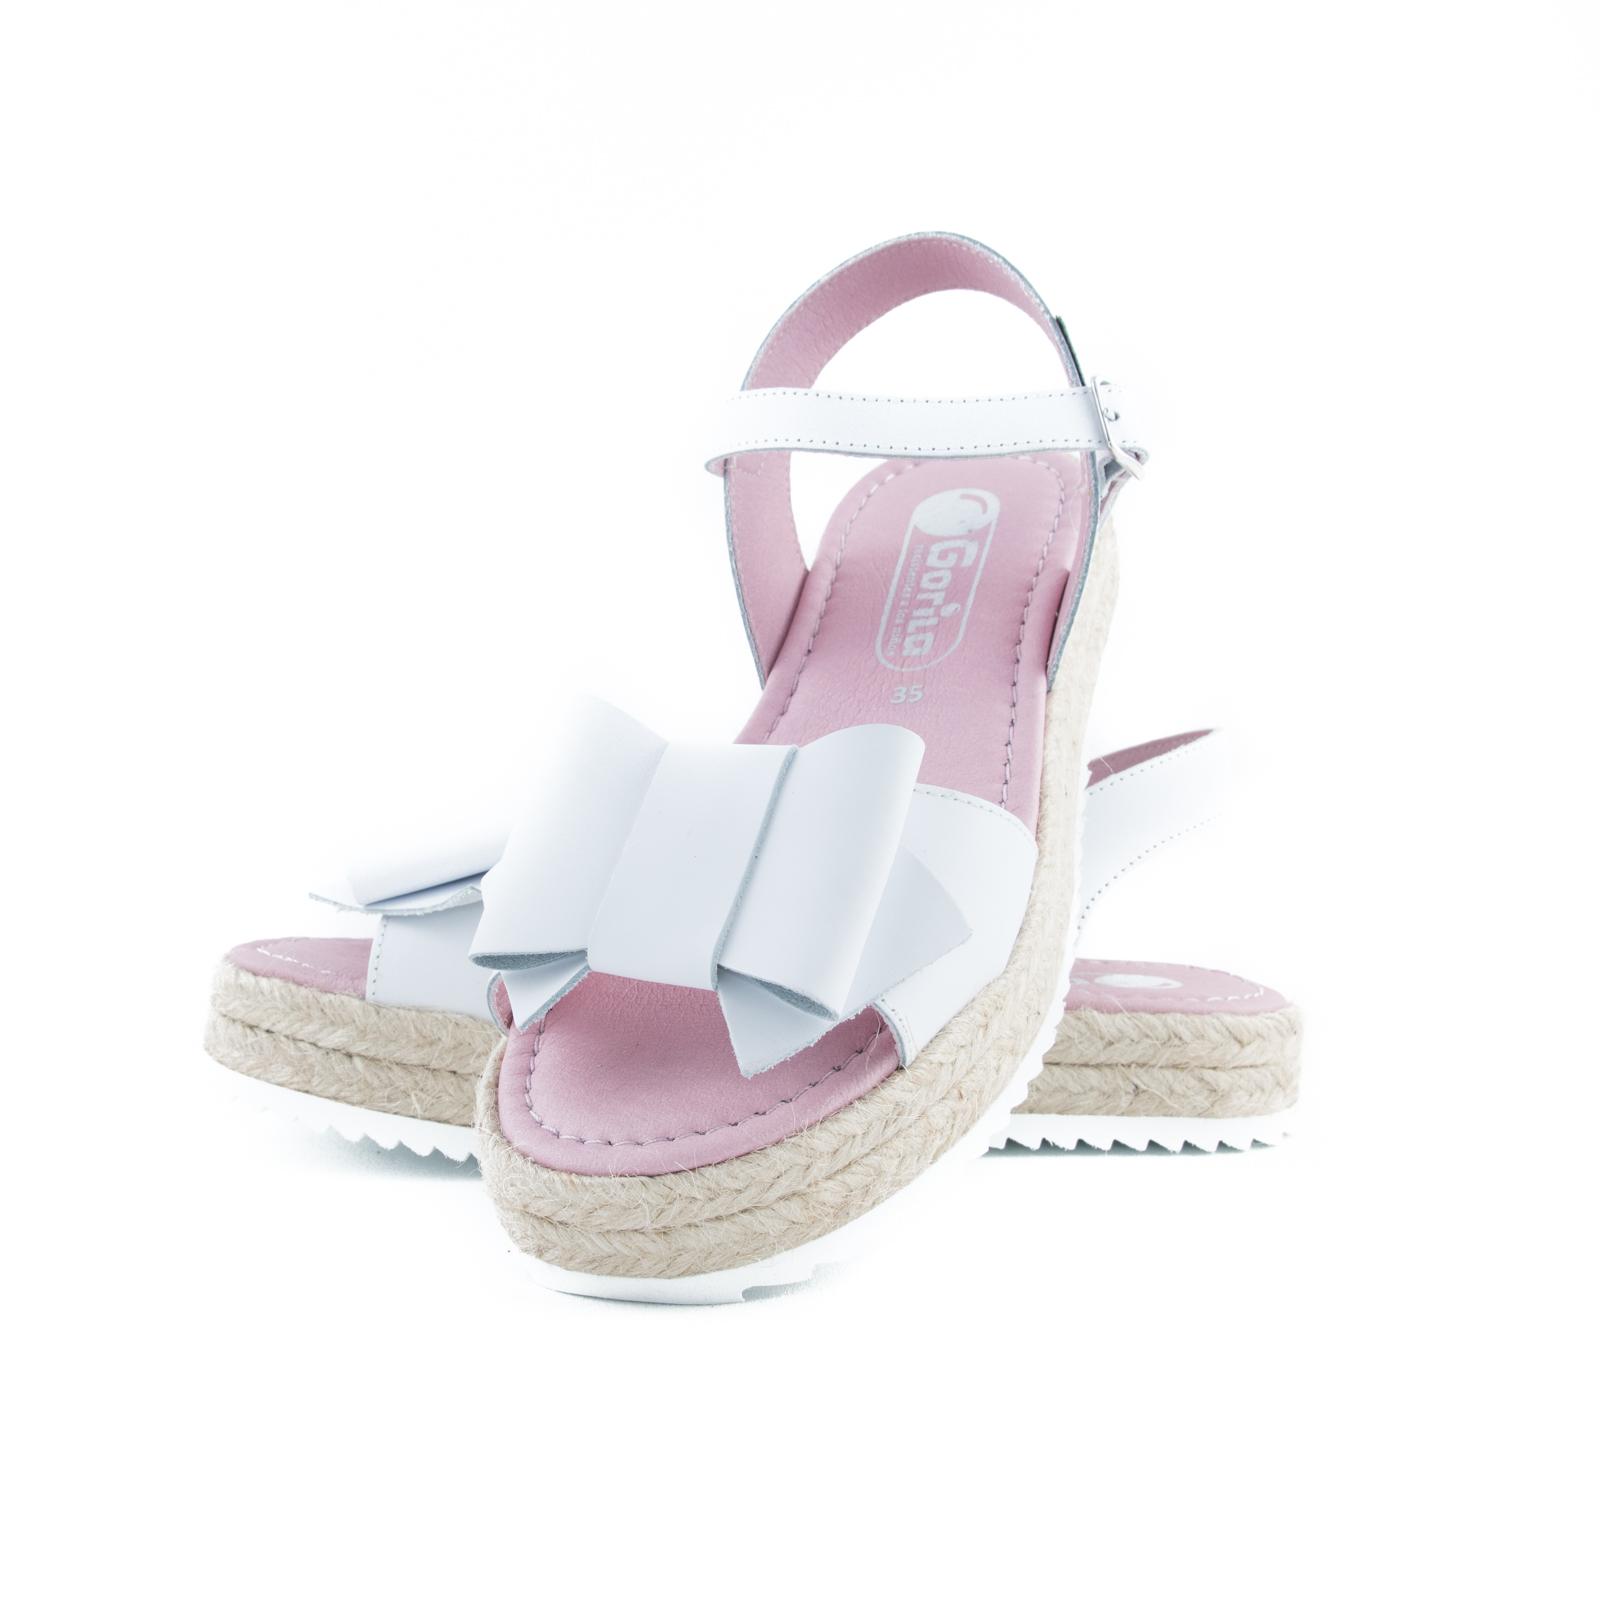 GORILA Sandals Big Bow White 42400